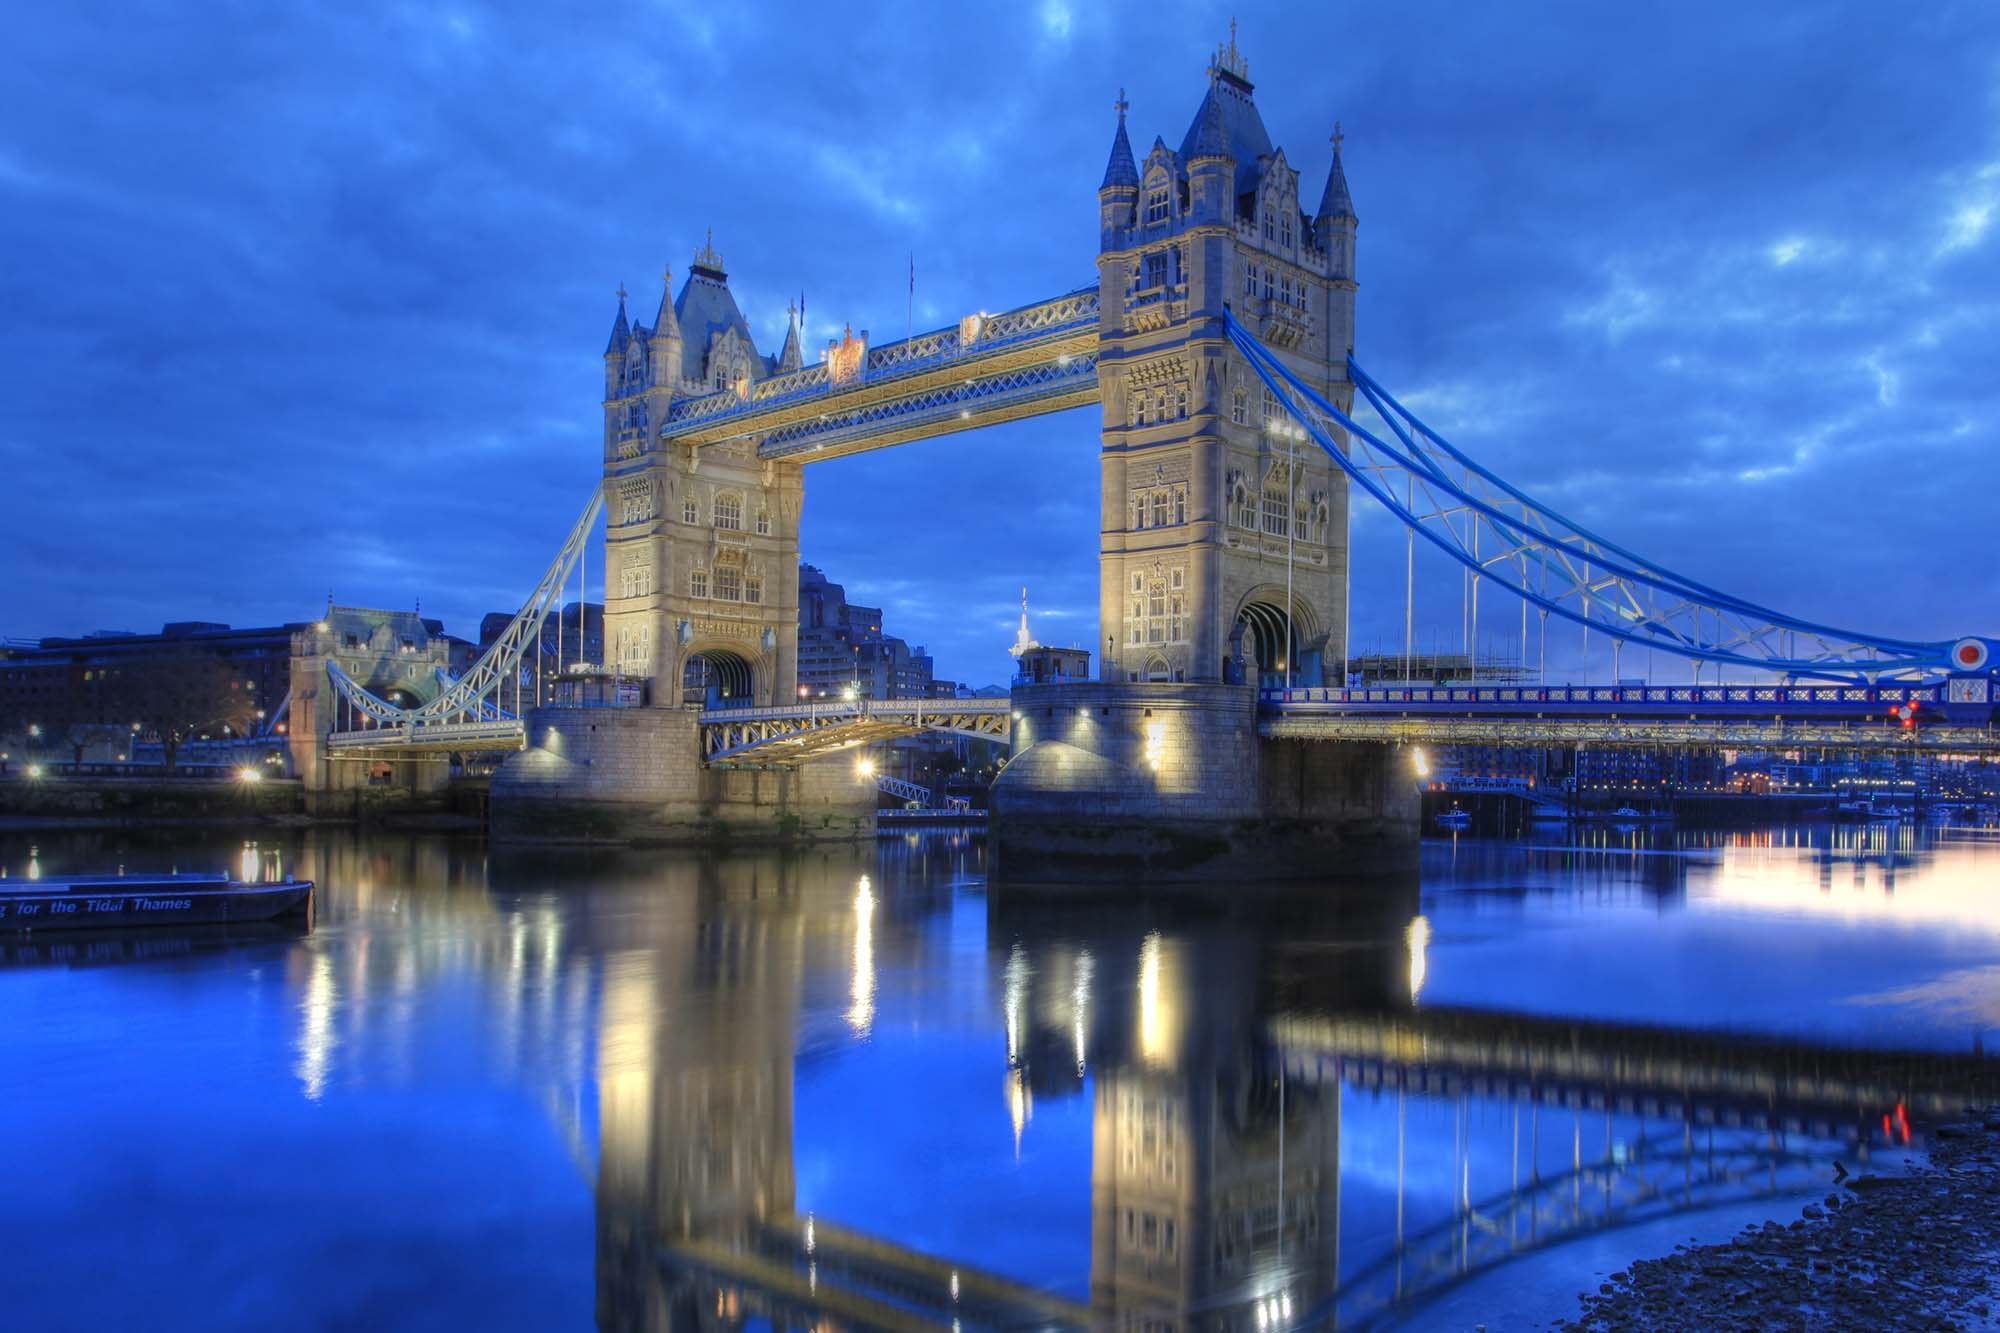 Tower Bridge - AmazingPlaces.com